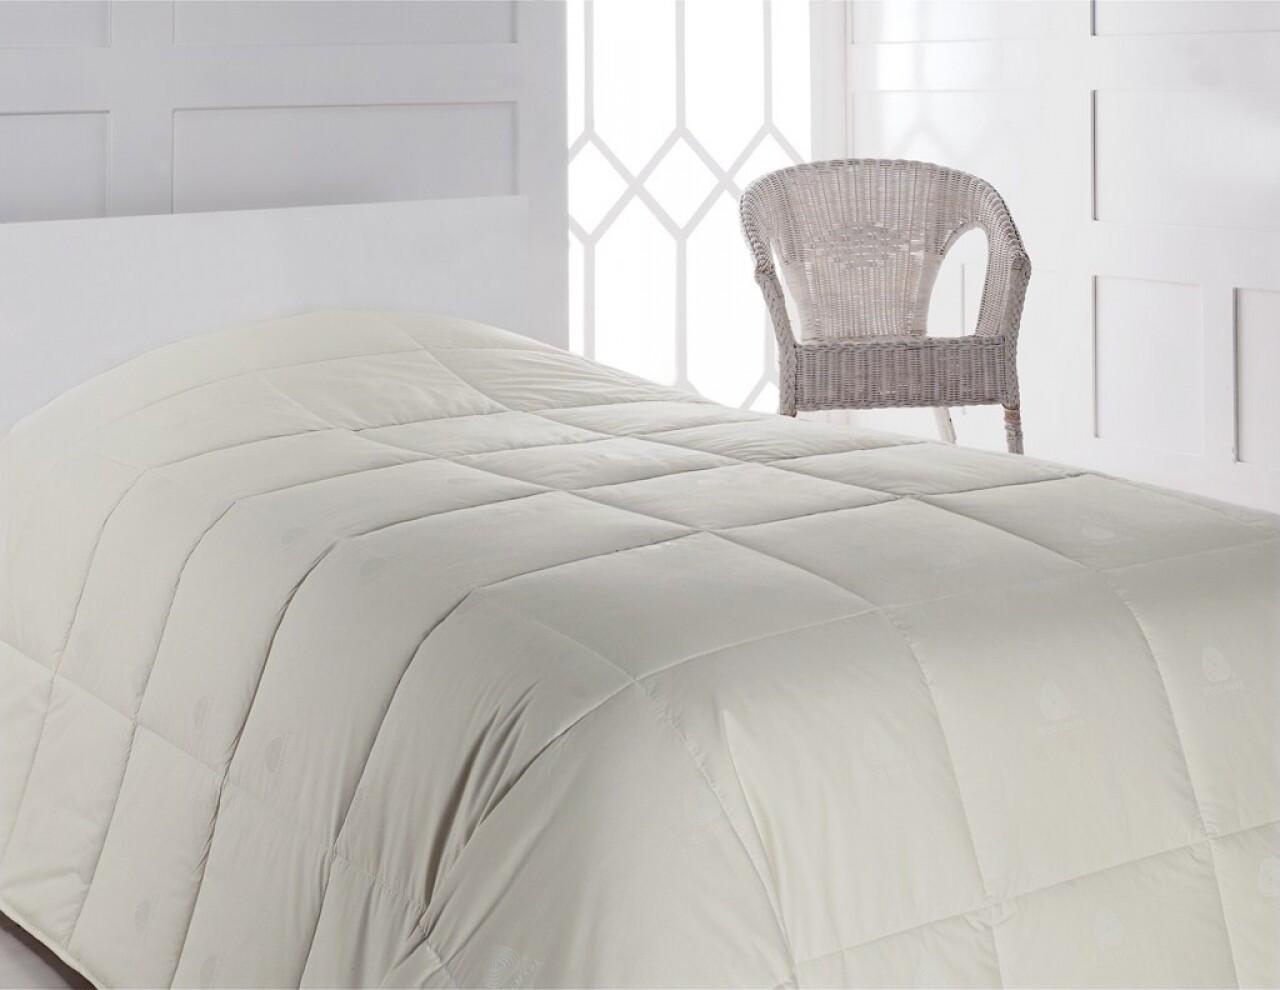 Pilota de pat pentru o persoana din 100% bumbac, 155x215 cm, Cotton Box,Ecru